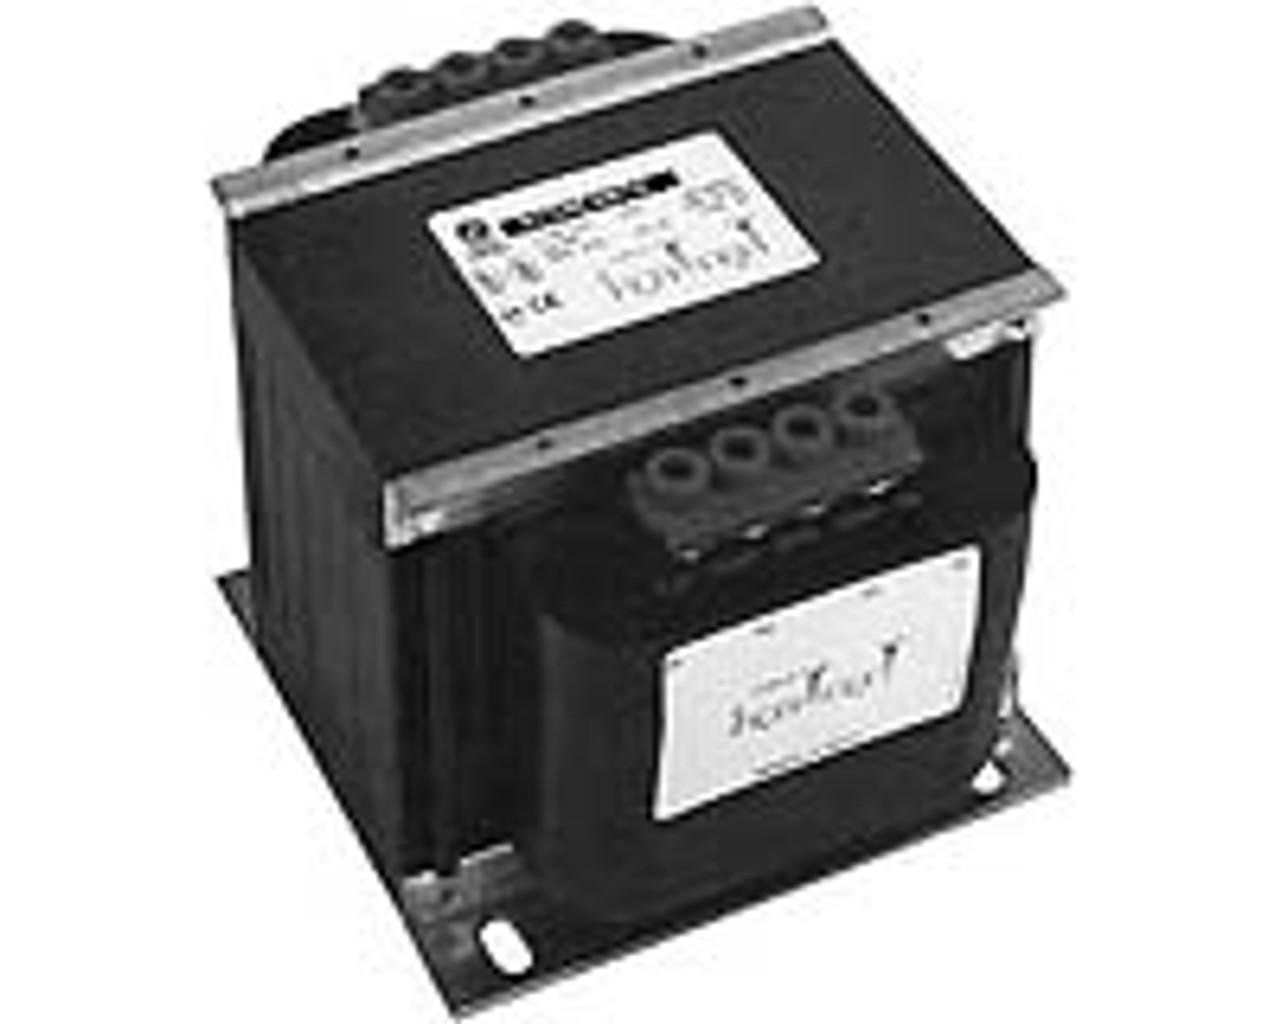 GE 9T58K3215 - 0.5 KVA 208/230/460 TO 115/95 VOLT 1PH TRANSFORMER - New